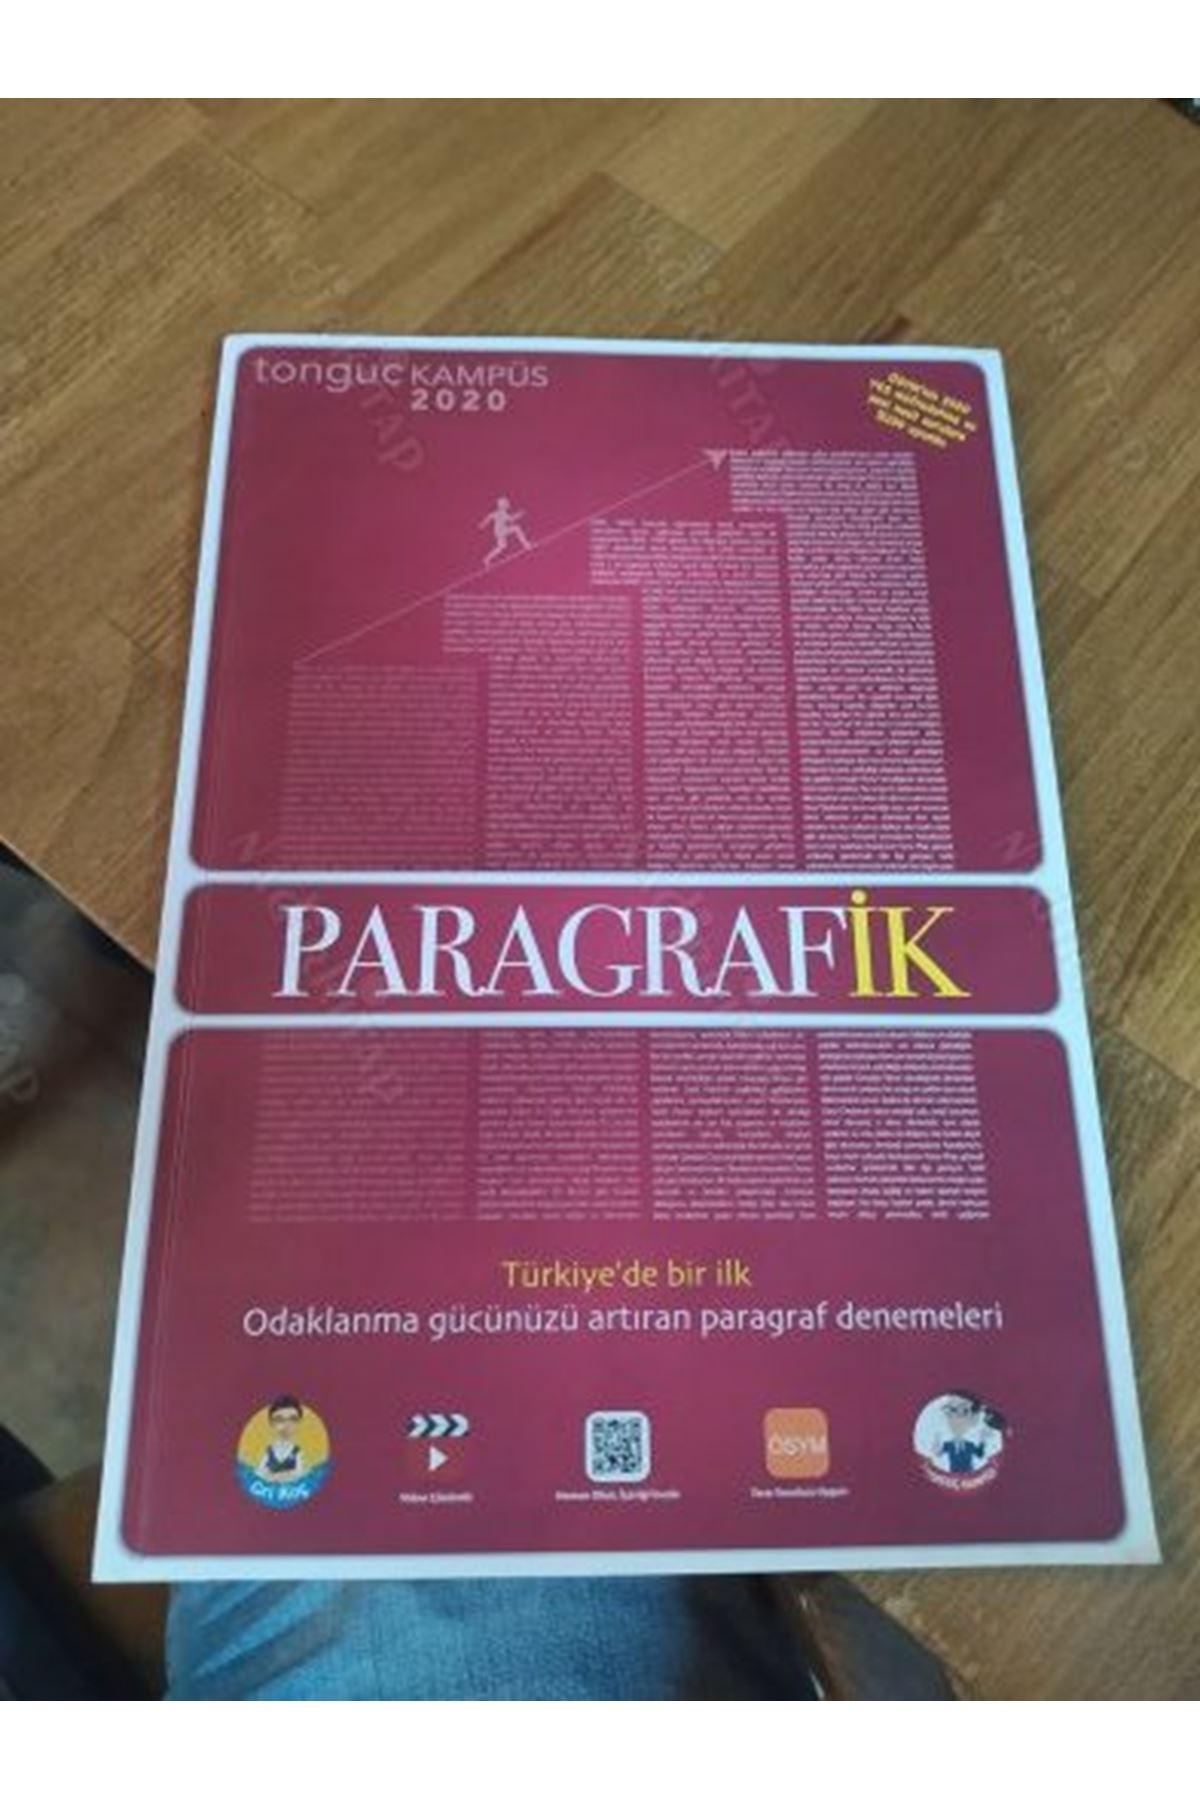 TONGUÇ KAMPÜS - PARAGRAFİK